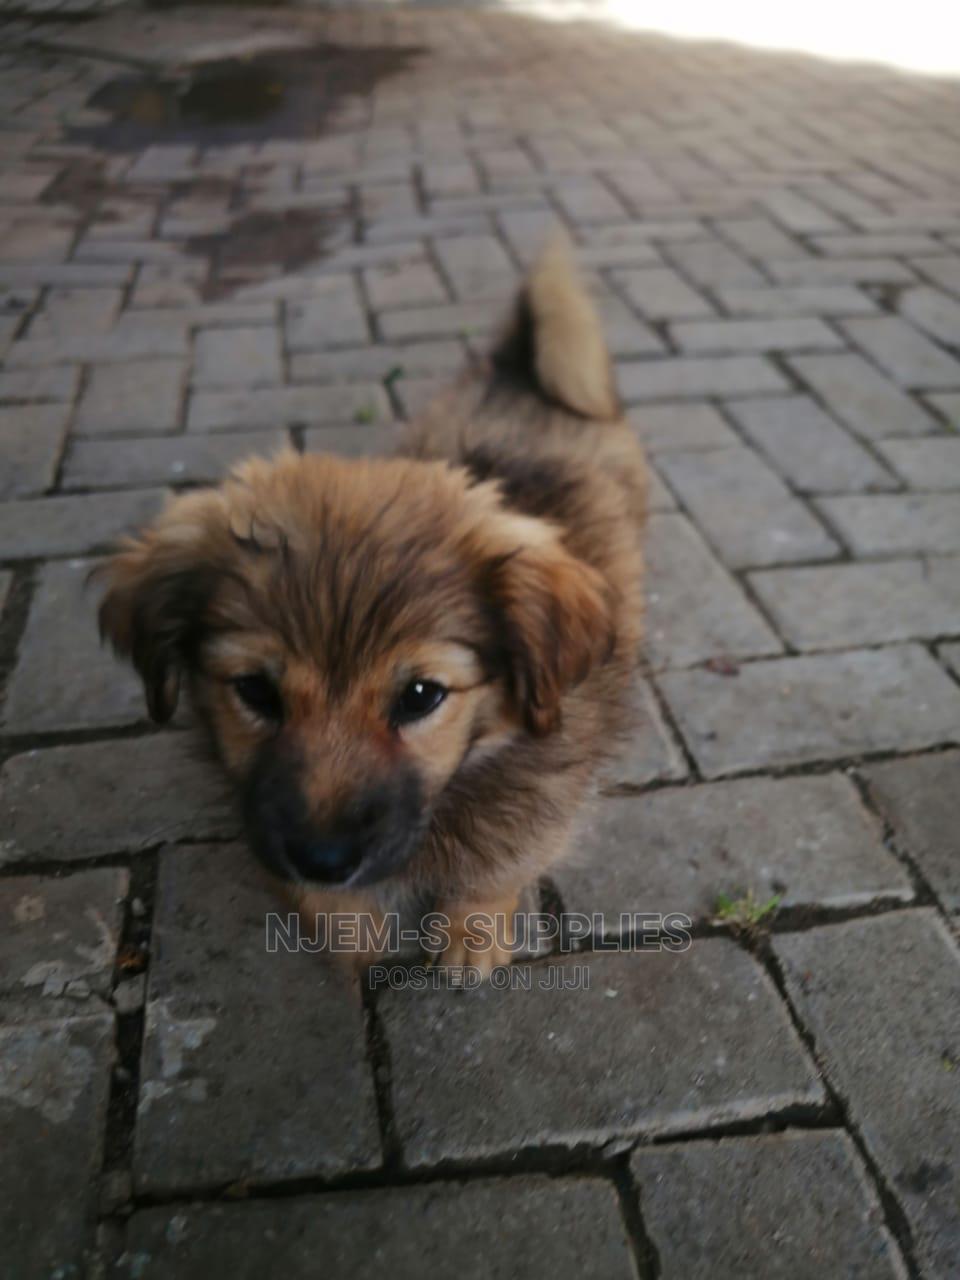 6-12 Month Female Mixed Breed German Shepherd